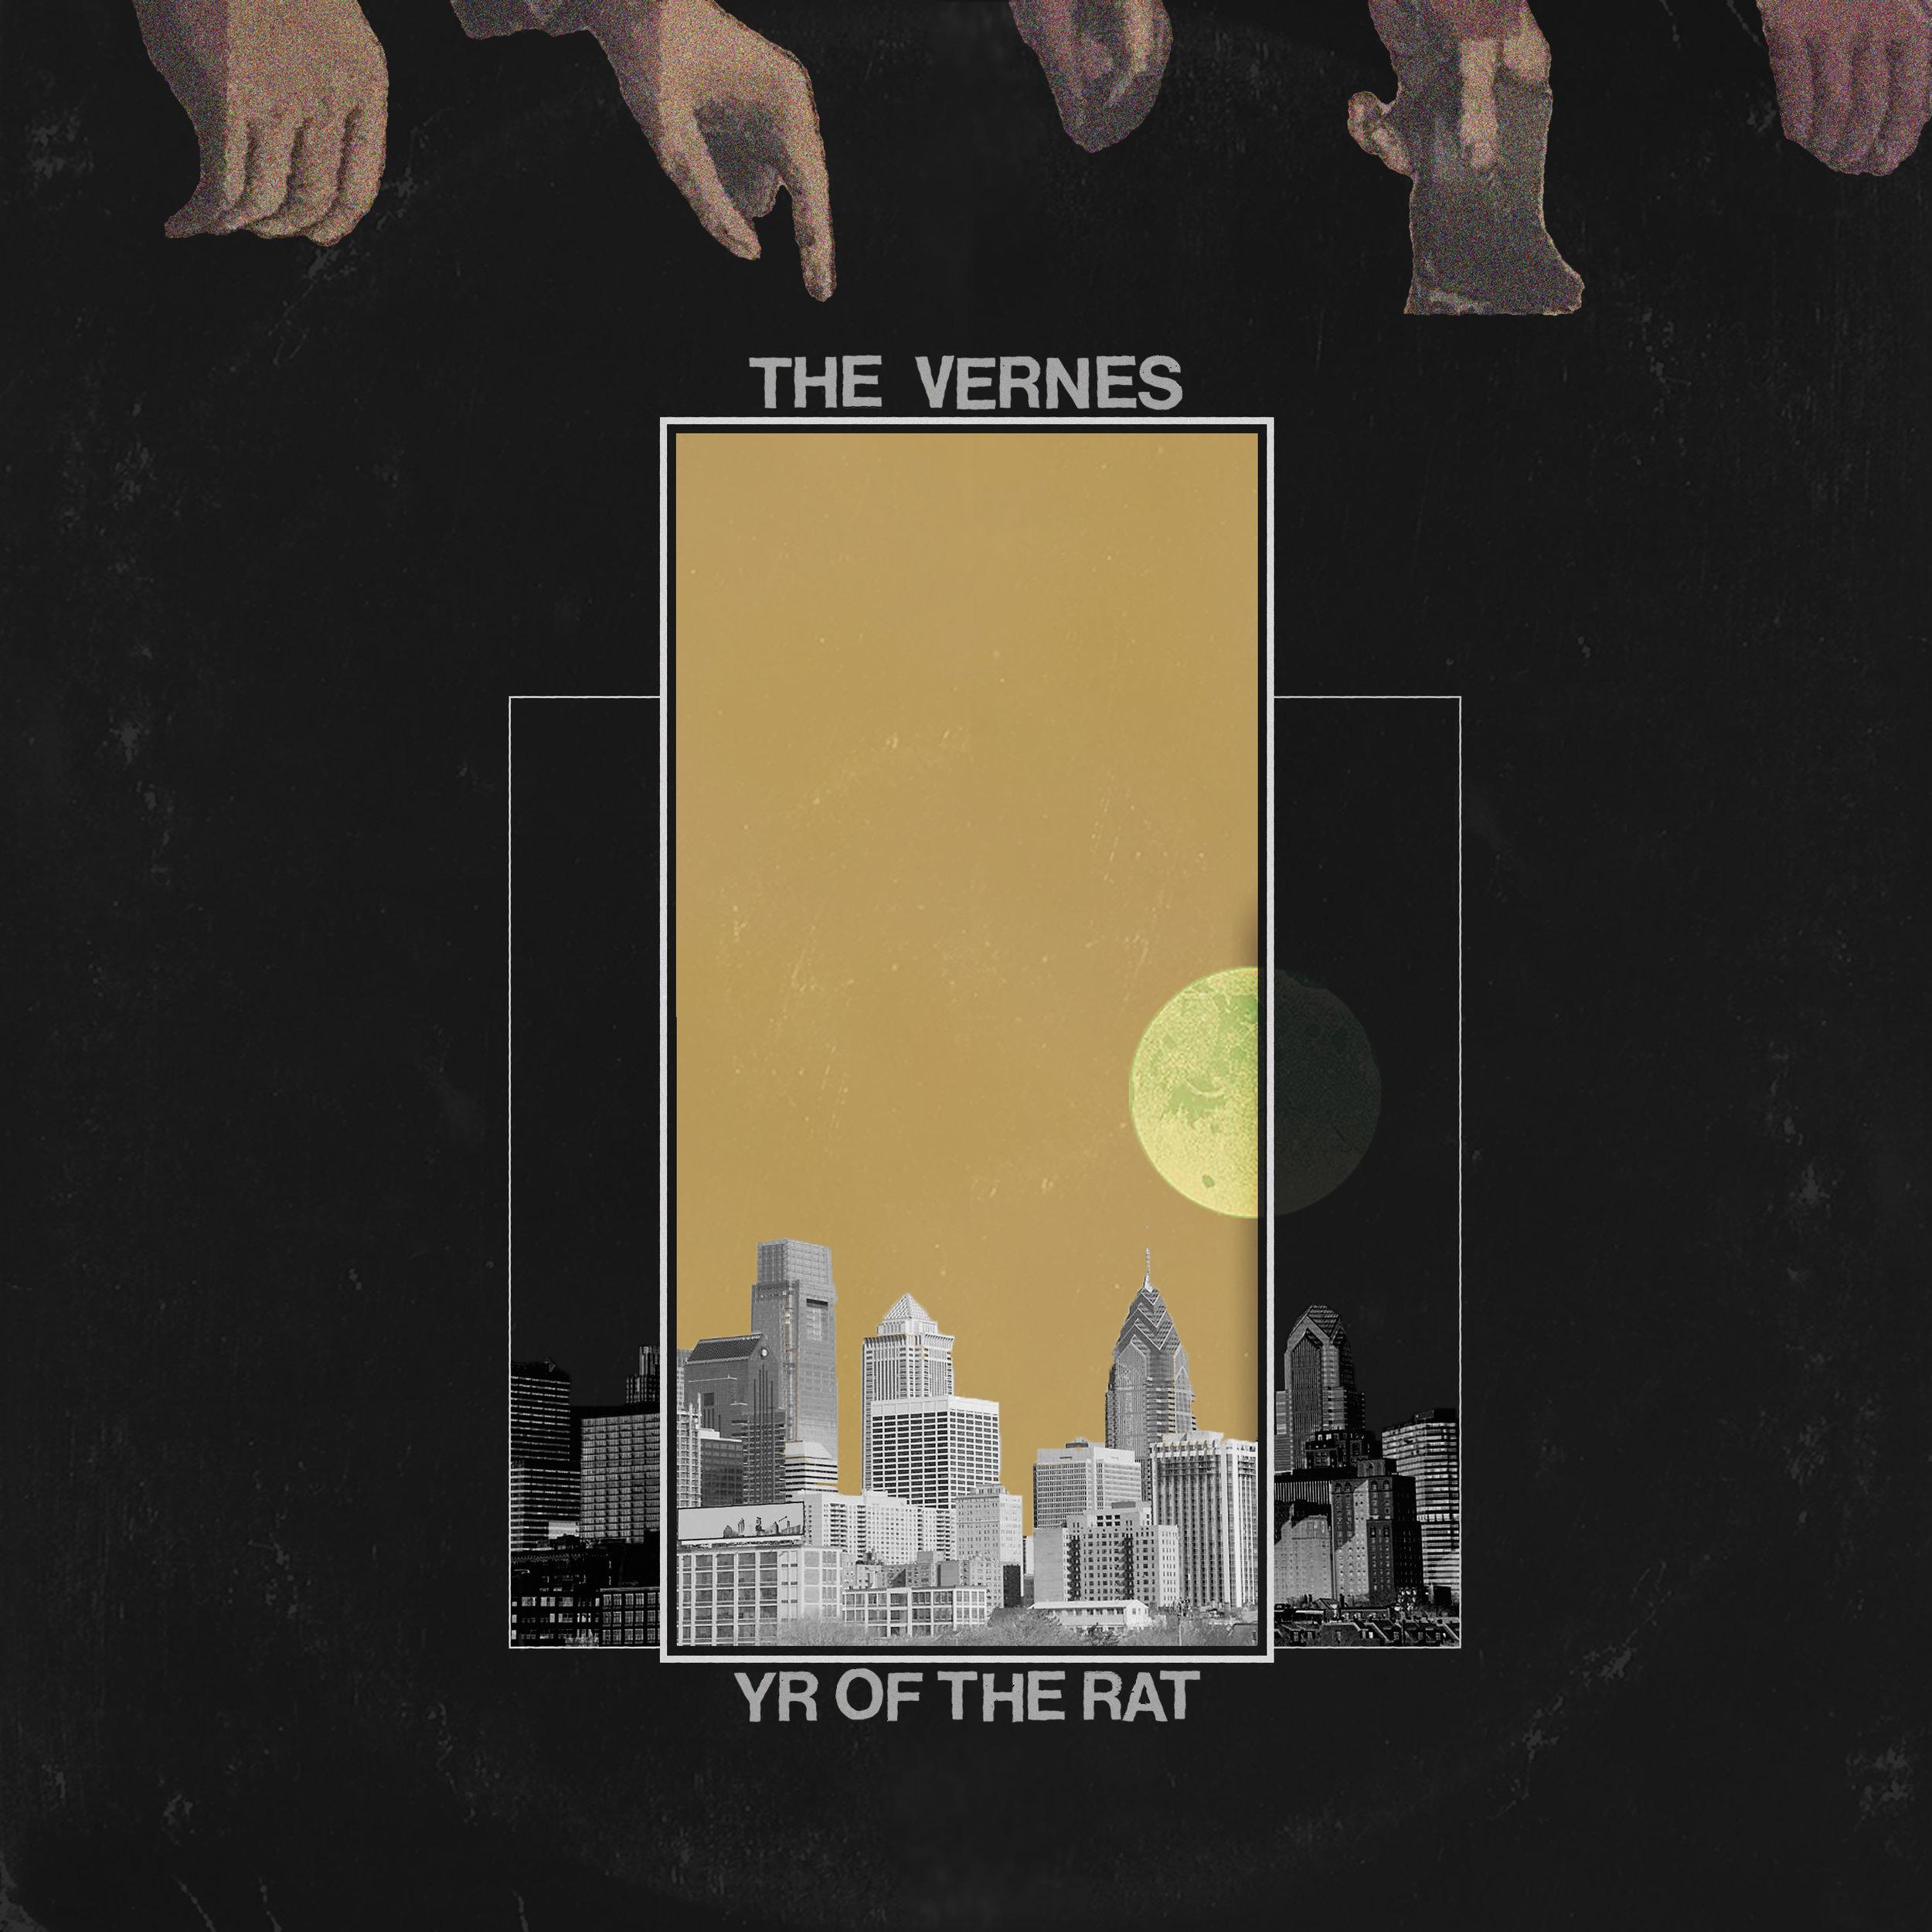 YR_OF_THE_RAT_ALBUM_ART.jpg